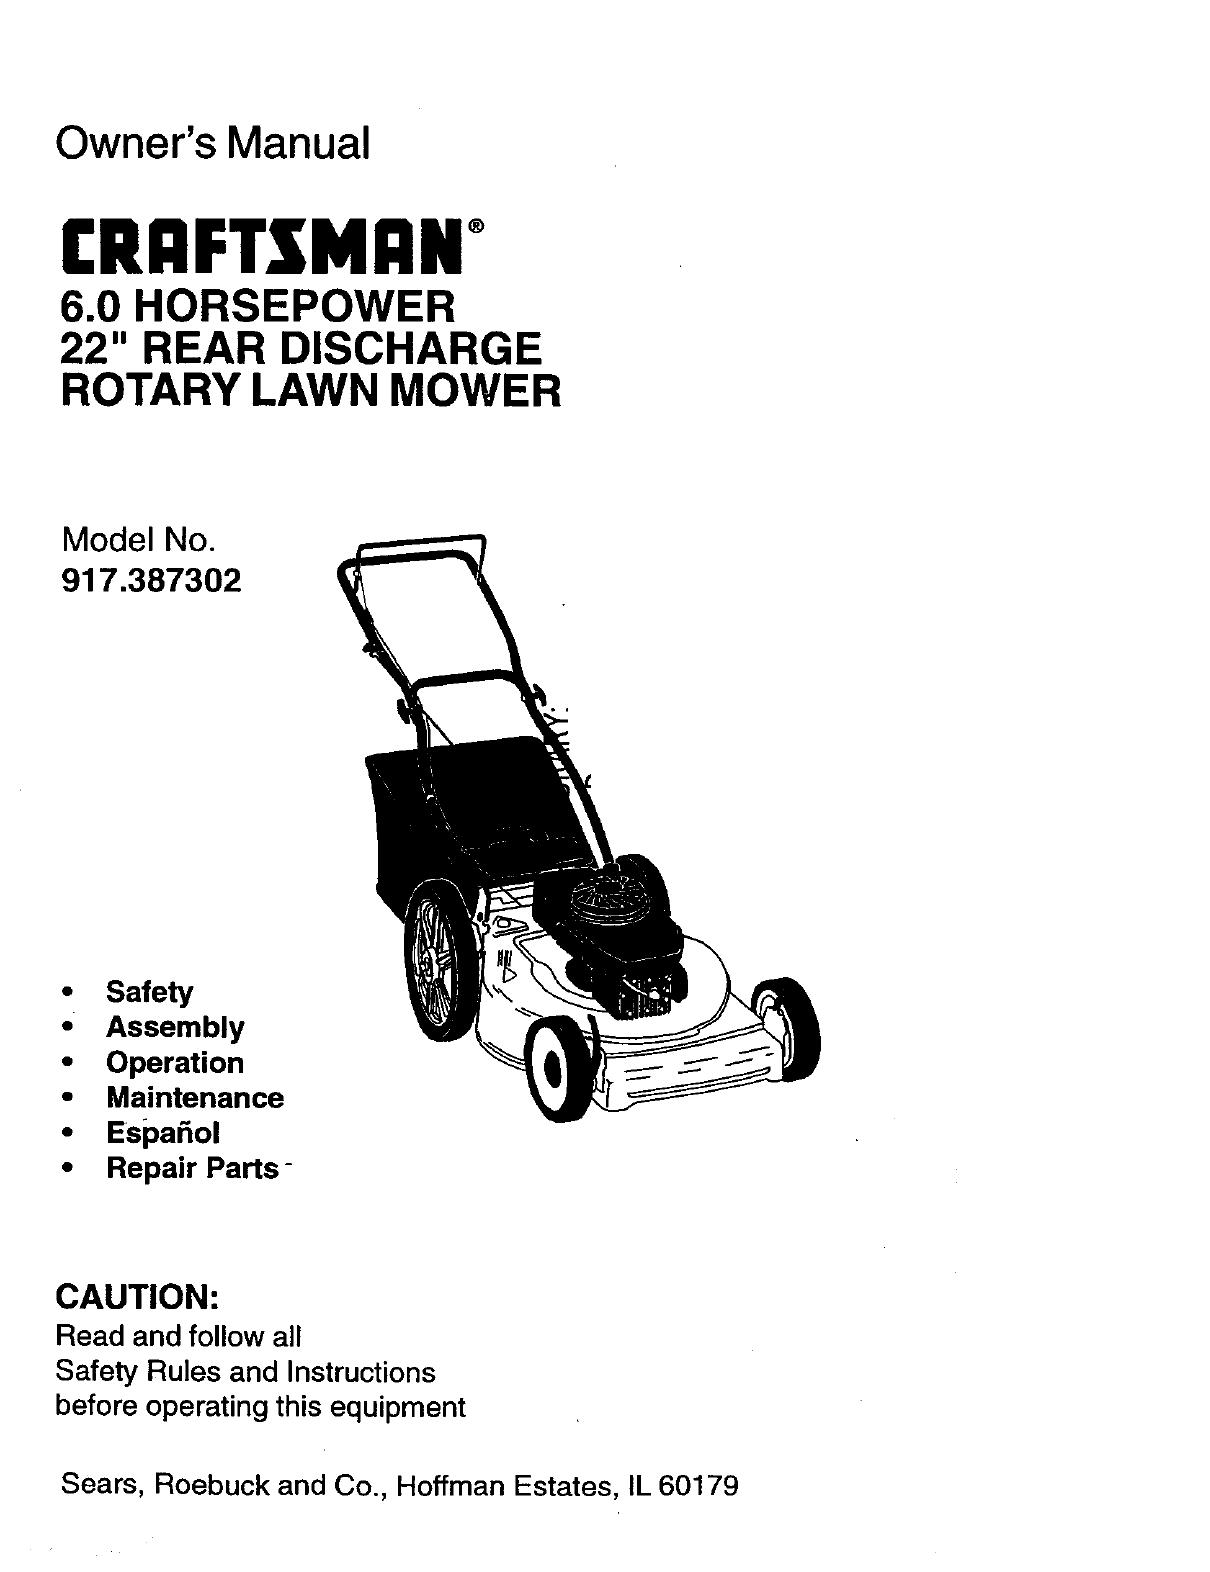 Craftsman 917387302 User Manual ROTARY MOWER Manuals And